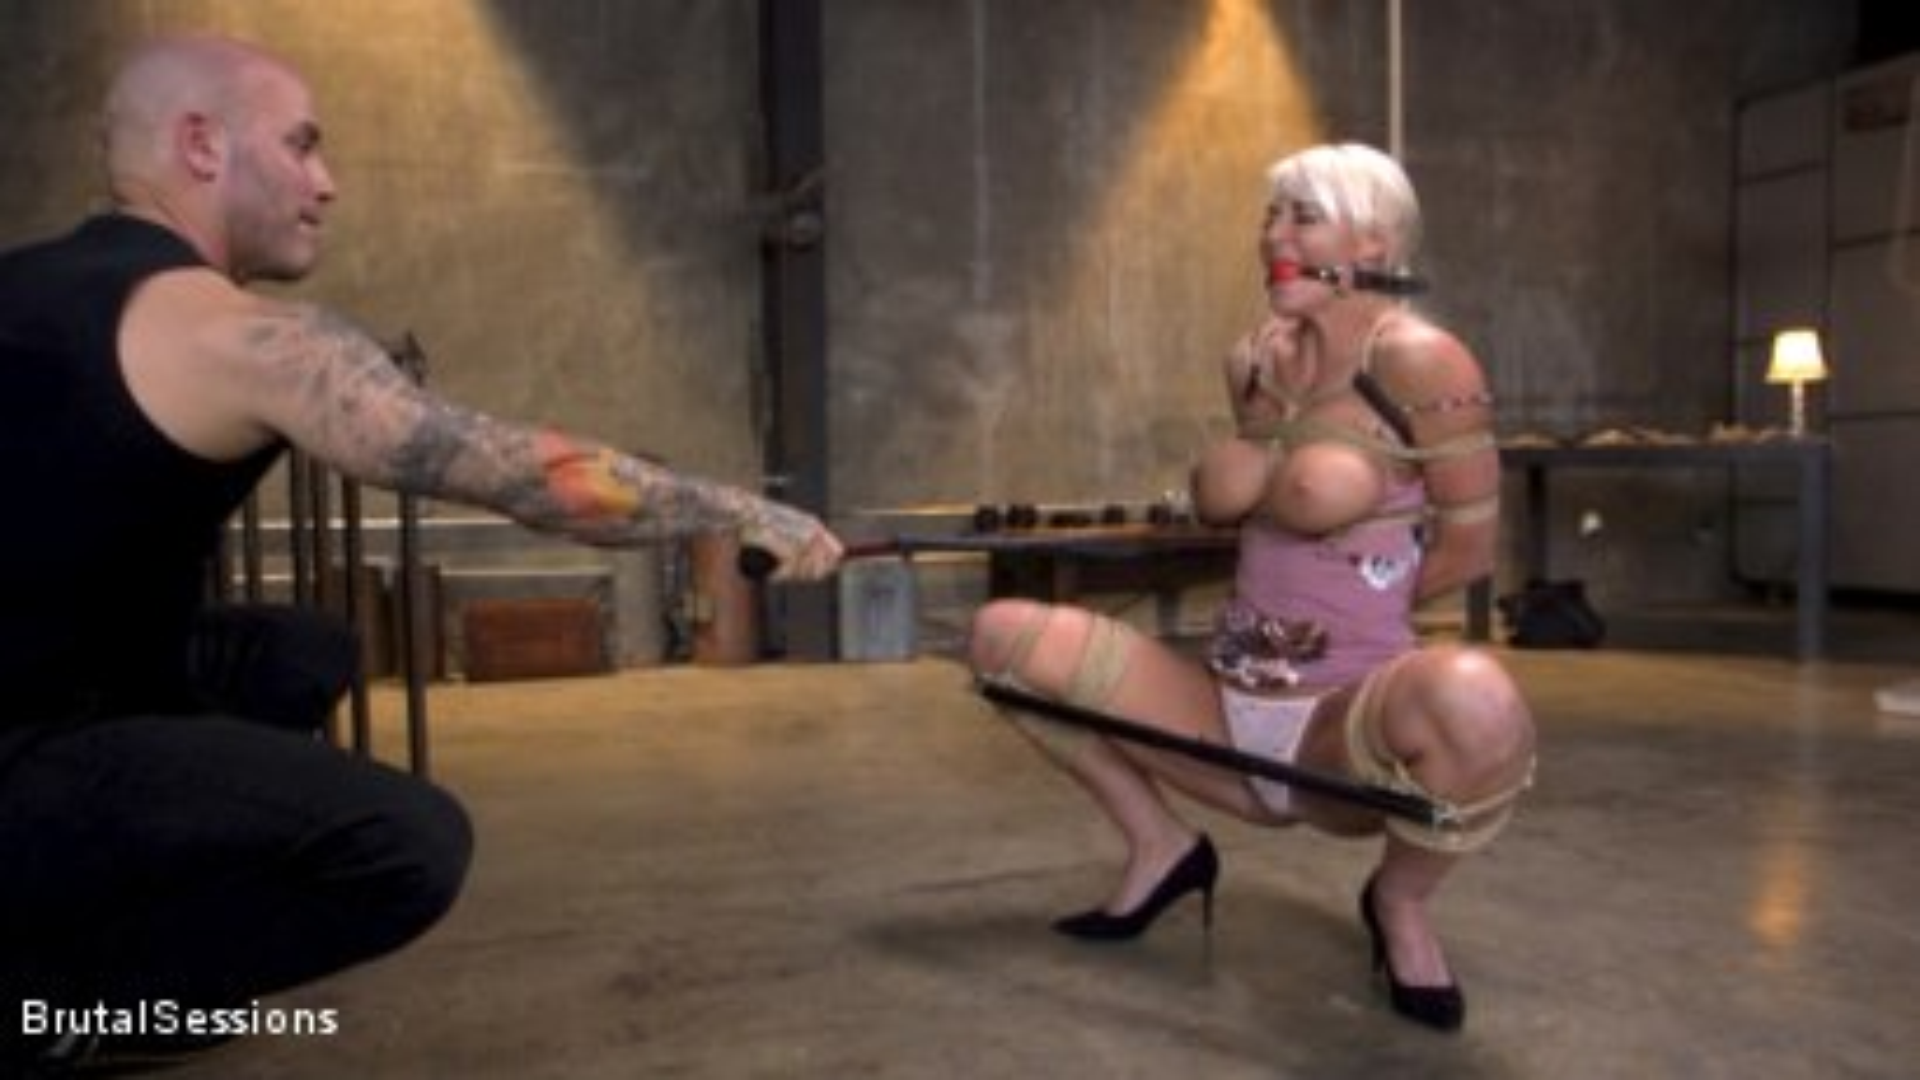 Electro Sex Bondage Torture